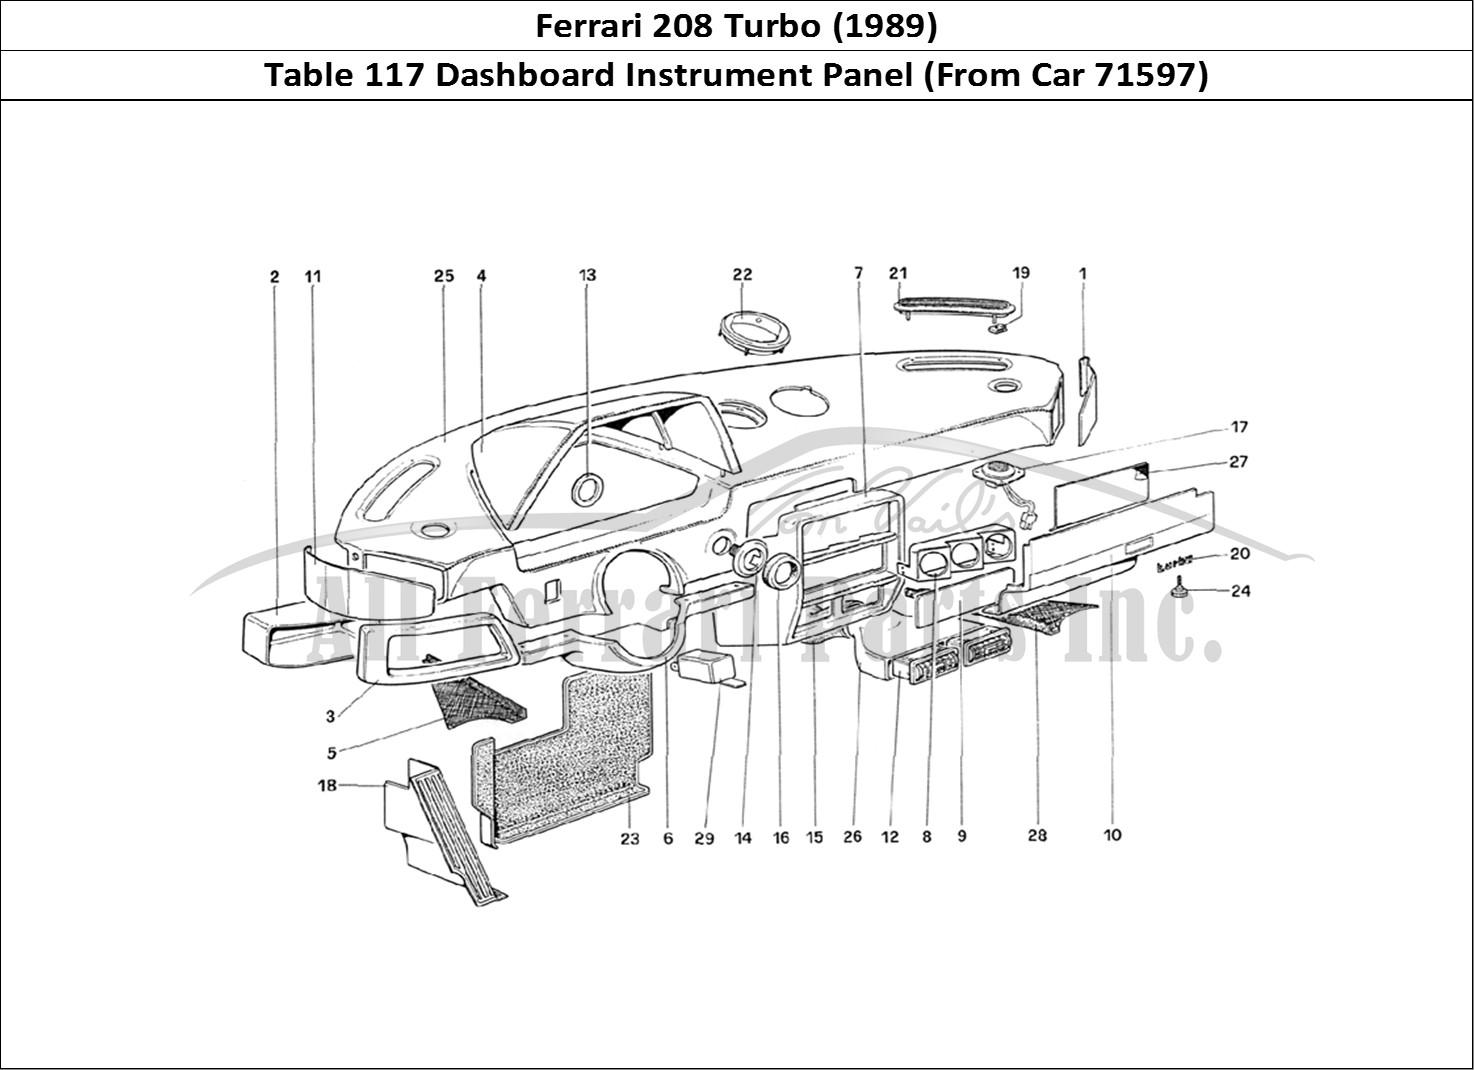 Buy Original Ferrari 208 Turbo 117 Dashboard